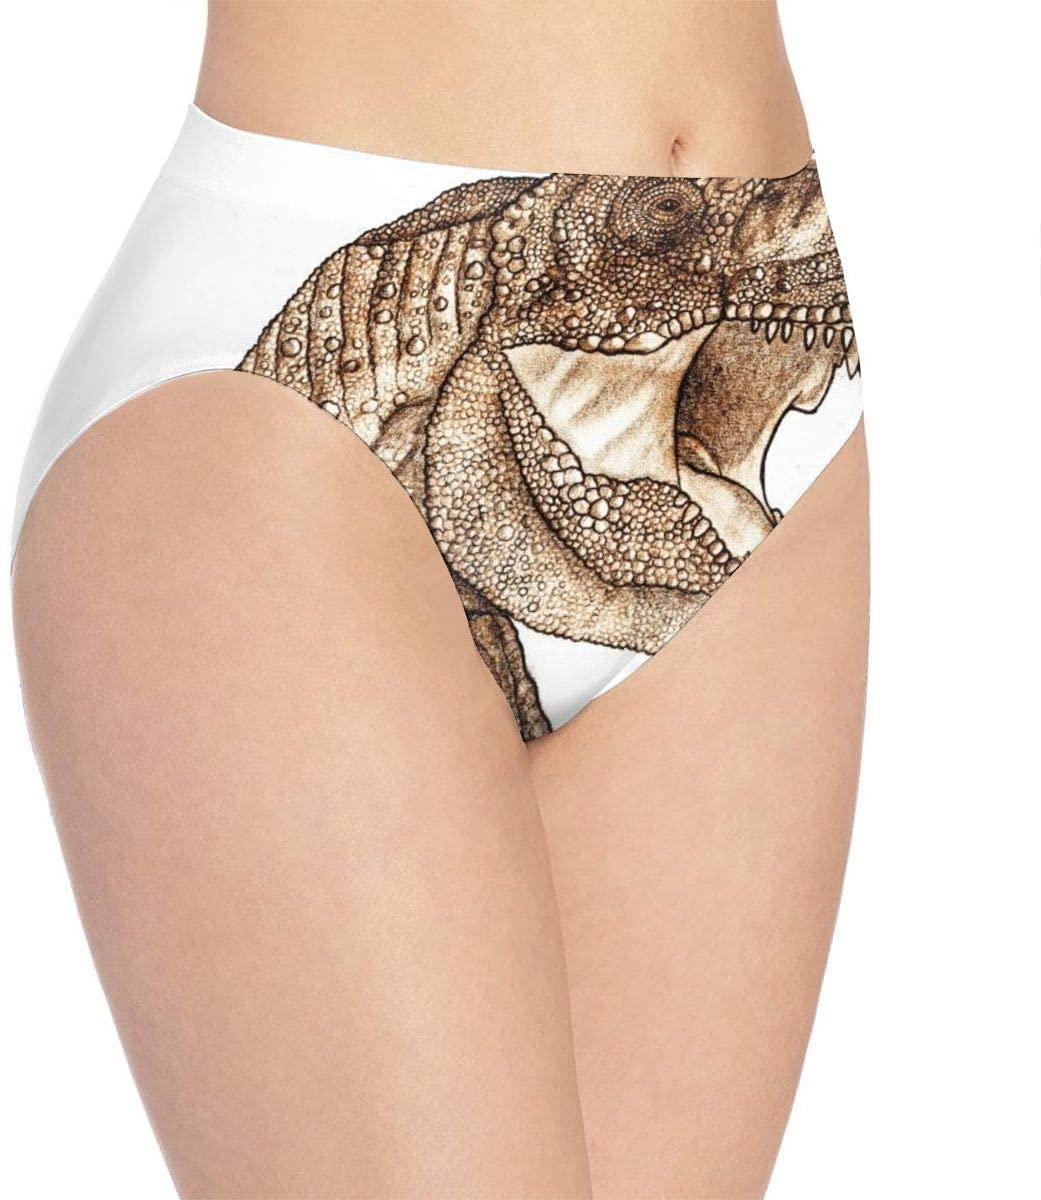 Kjaoi 3D Print Soft Women's Underwear, Dinosaur Fashion Flirty Sexy Lady's Panties Briefs